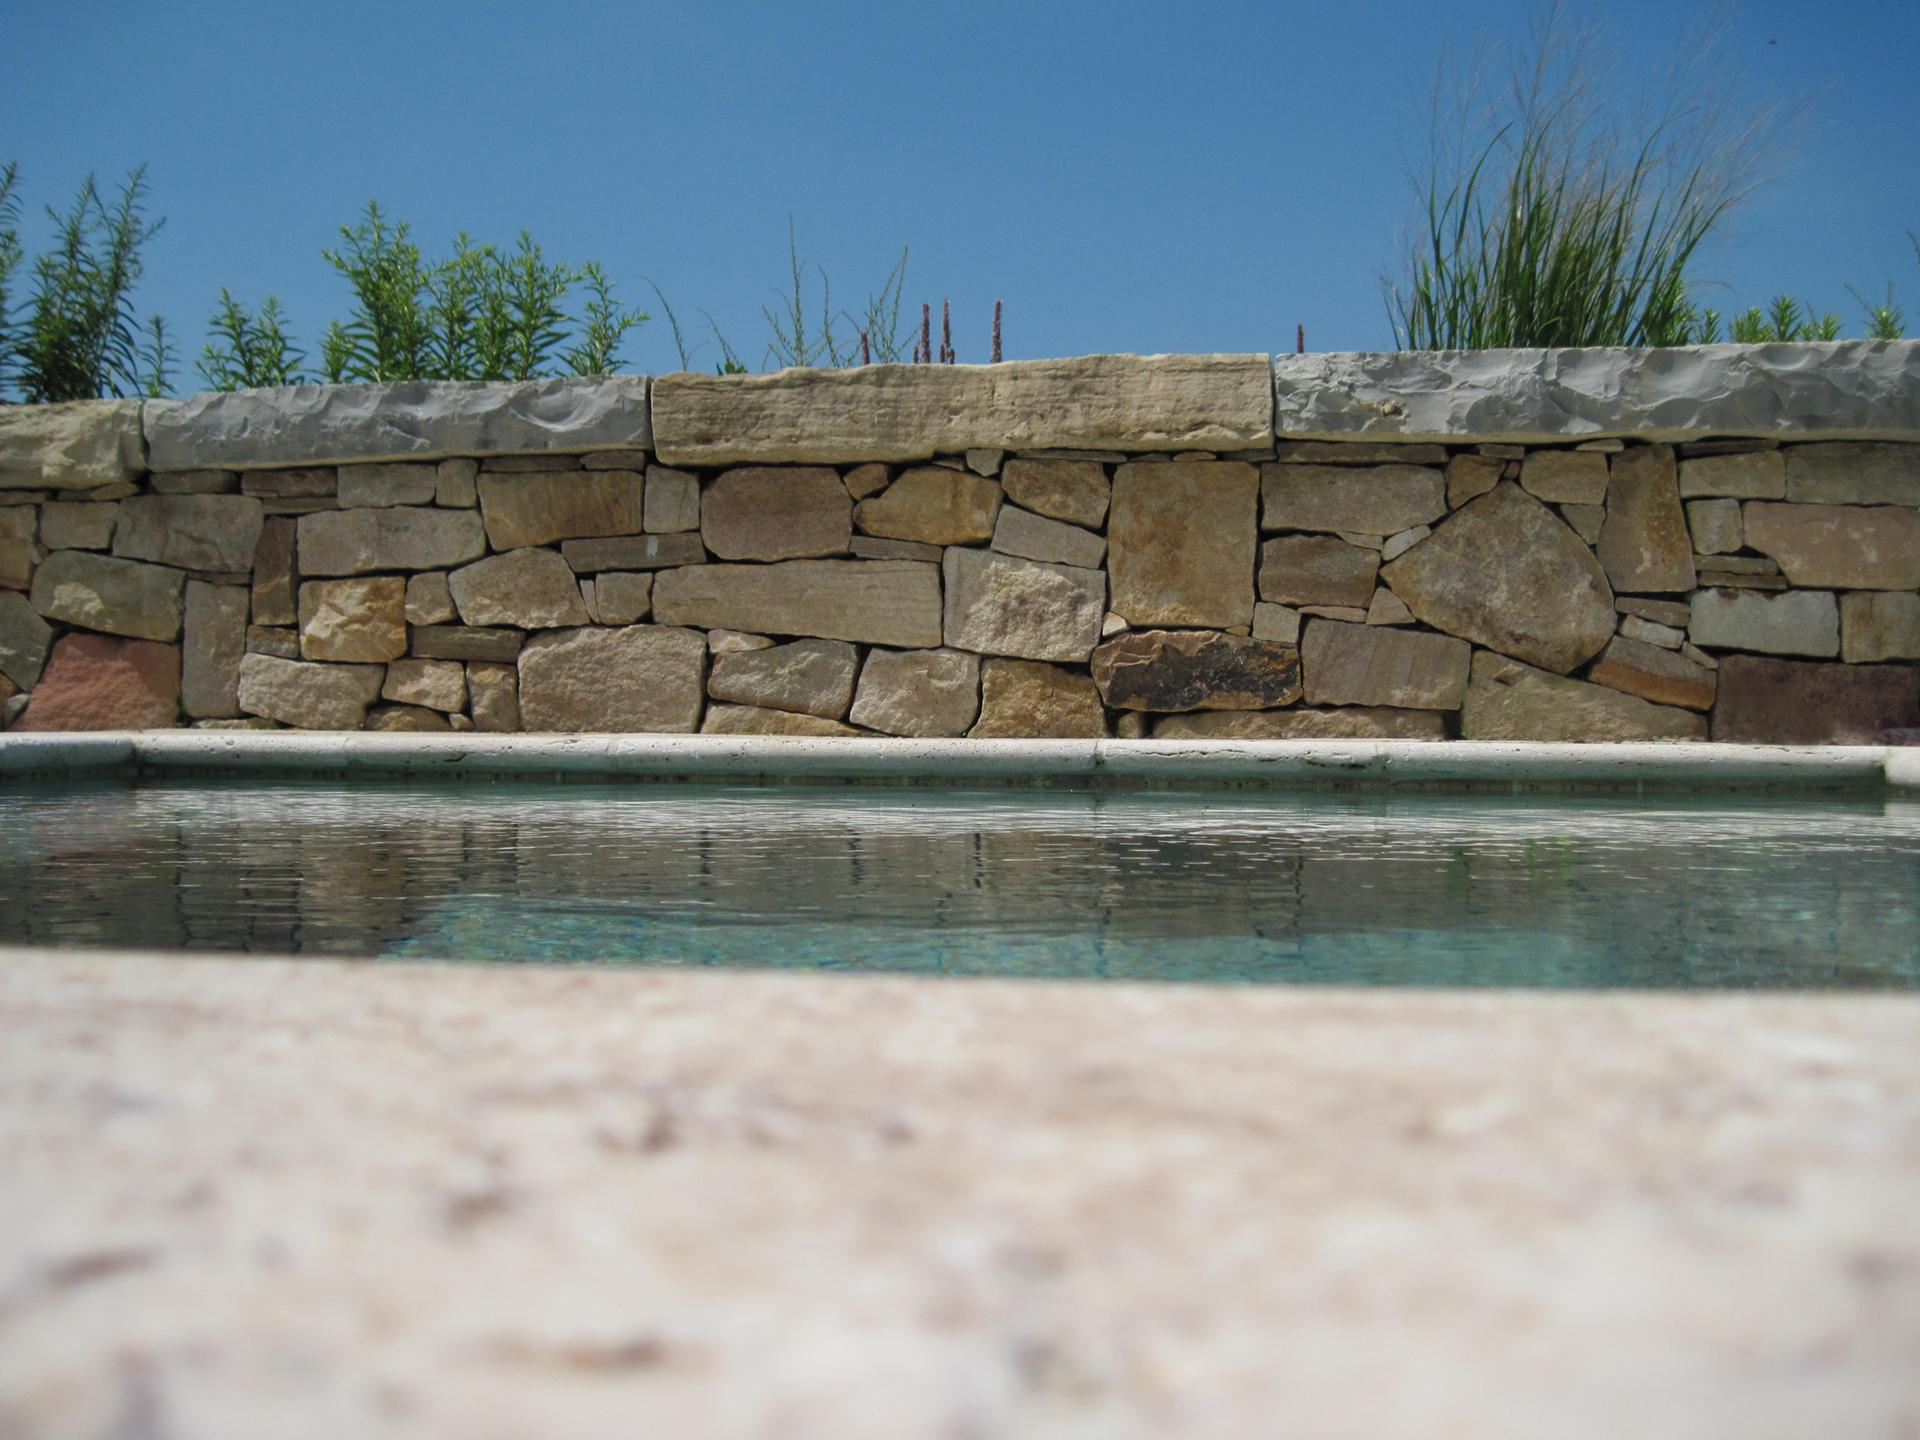 stone-wall-paving-design-custom-pool-beach-living-nj